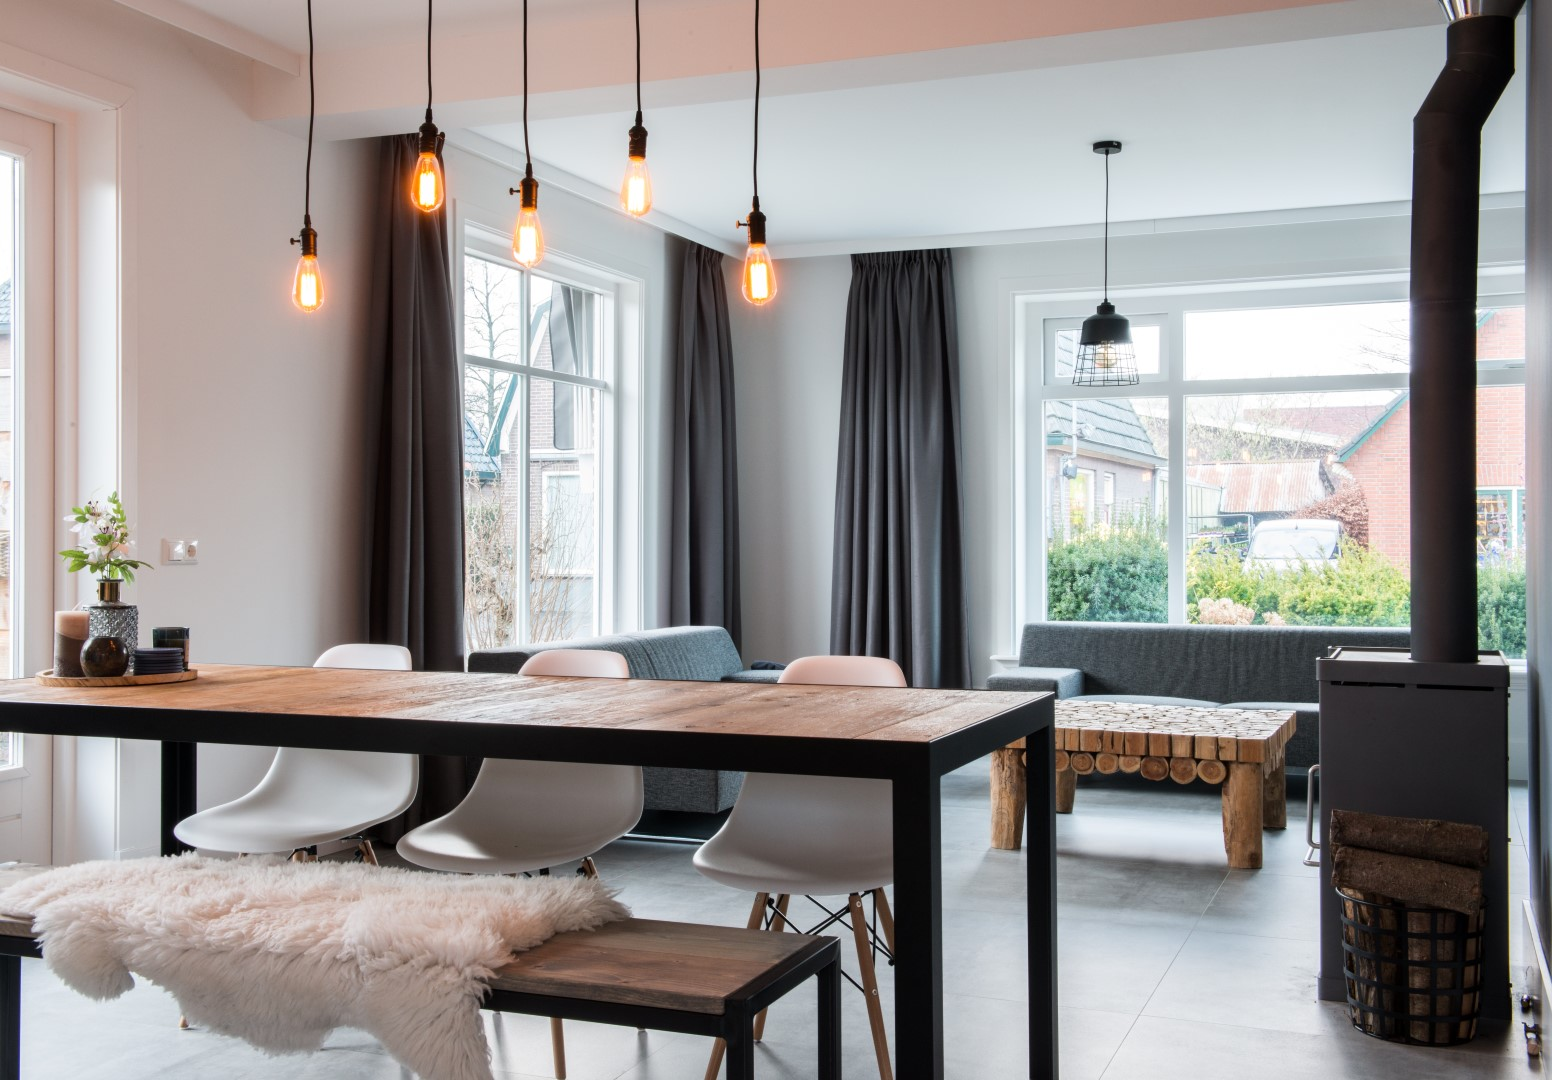 https://peterseninterieur.nl/wp-content/uploads/2018/01/woonkamer-meubel-op-maat.jpg